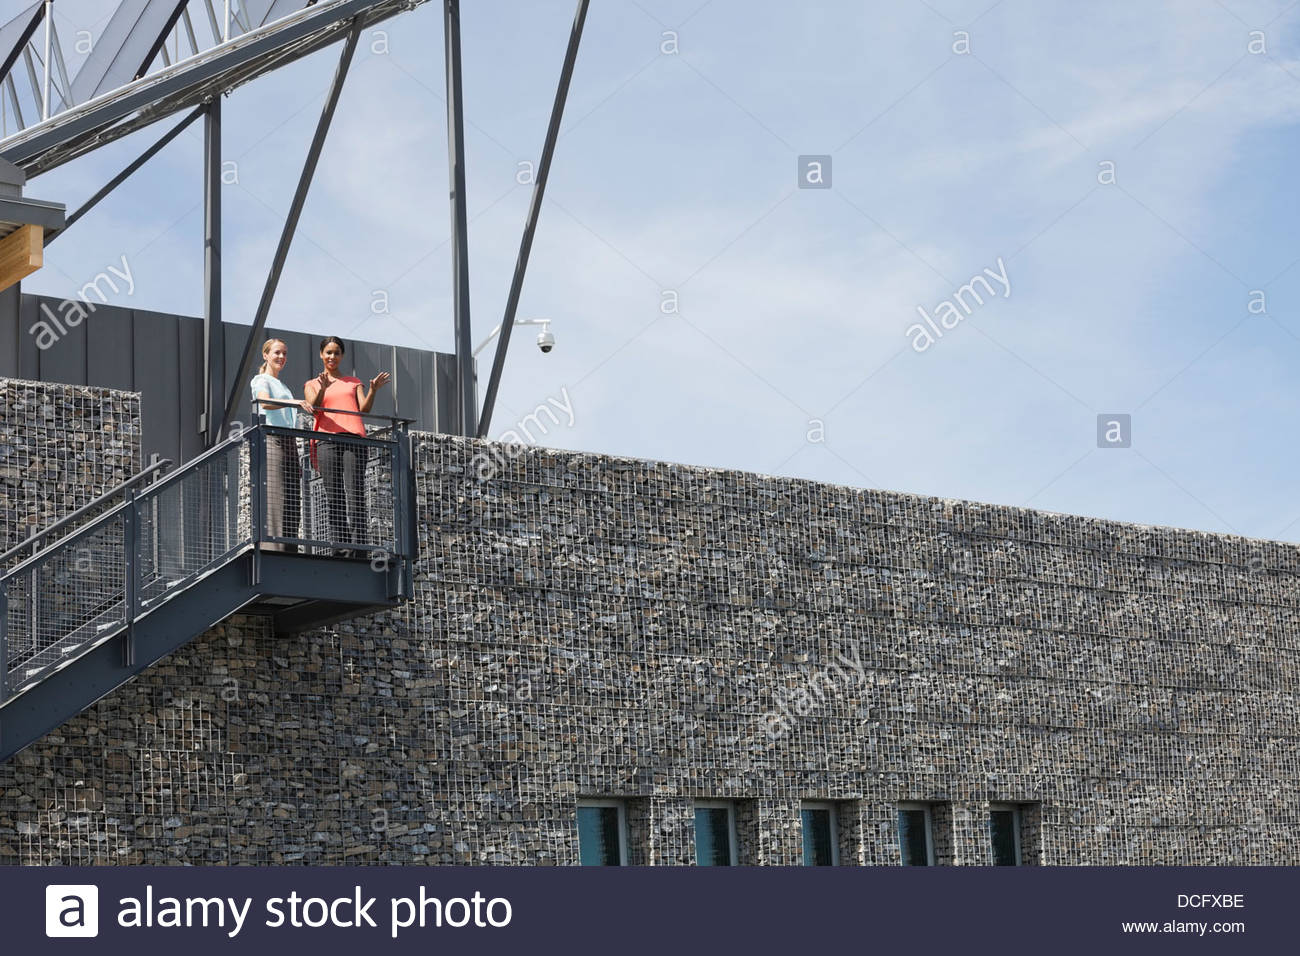 Businesswomen envisioning future plans - Stock Image